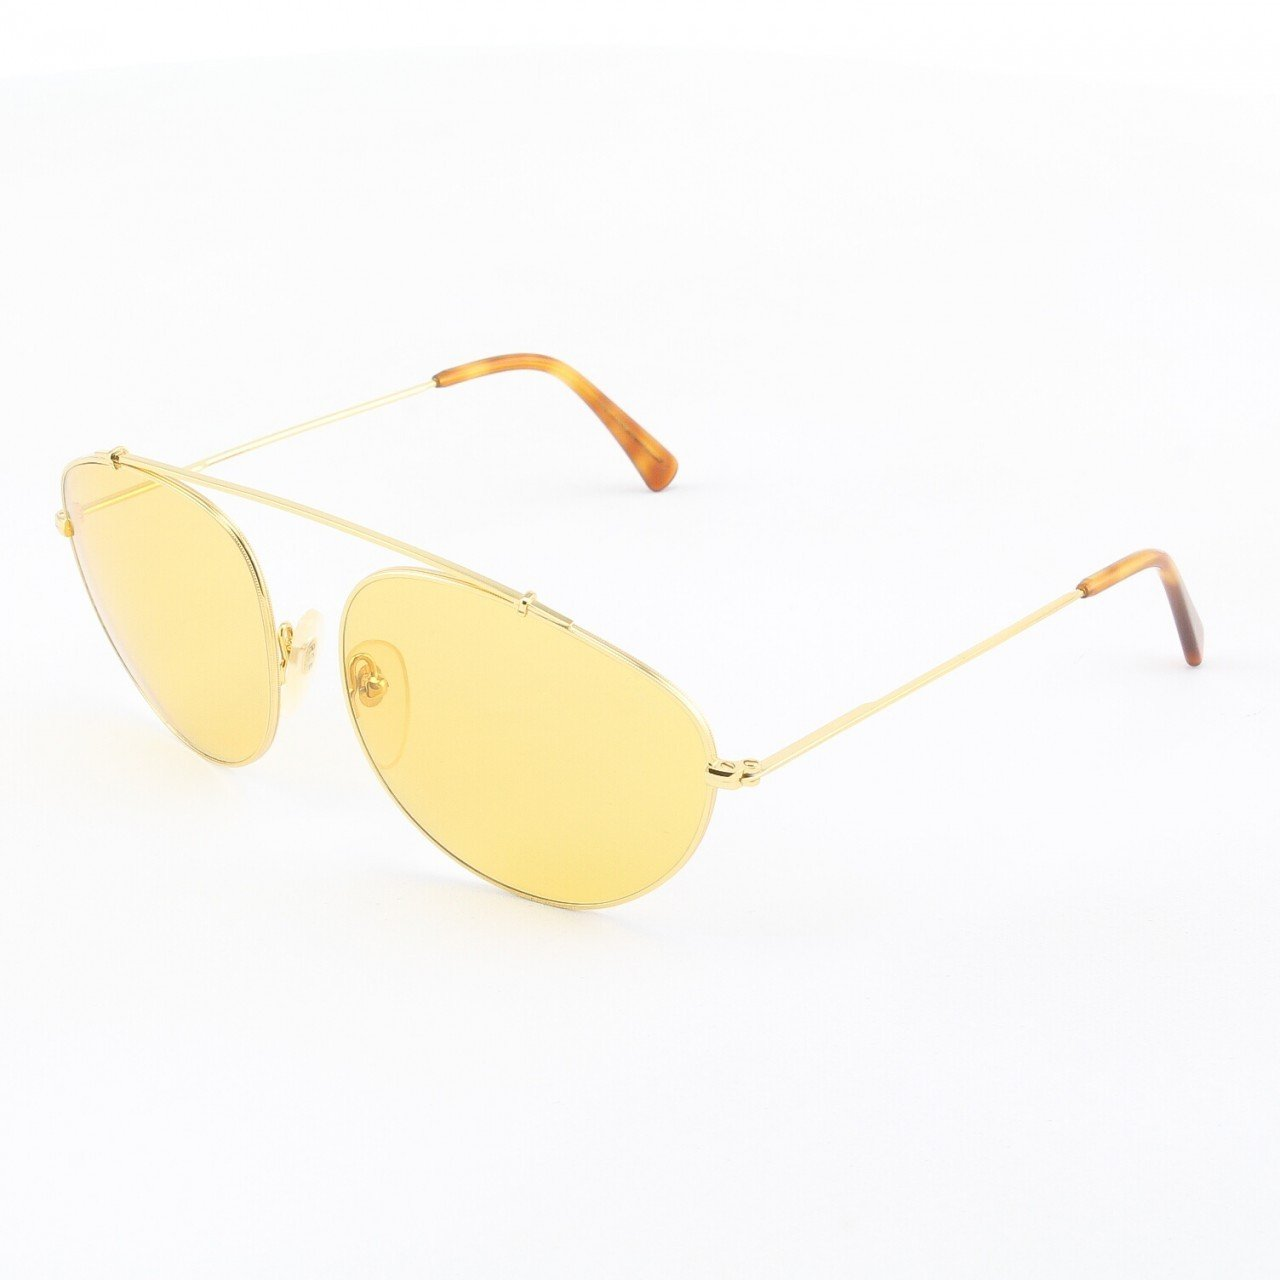 Super Leon 714 Sunglasses Havana with Yellow Zeiss Lenses by RETROSUPERFUTURE